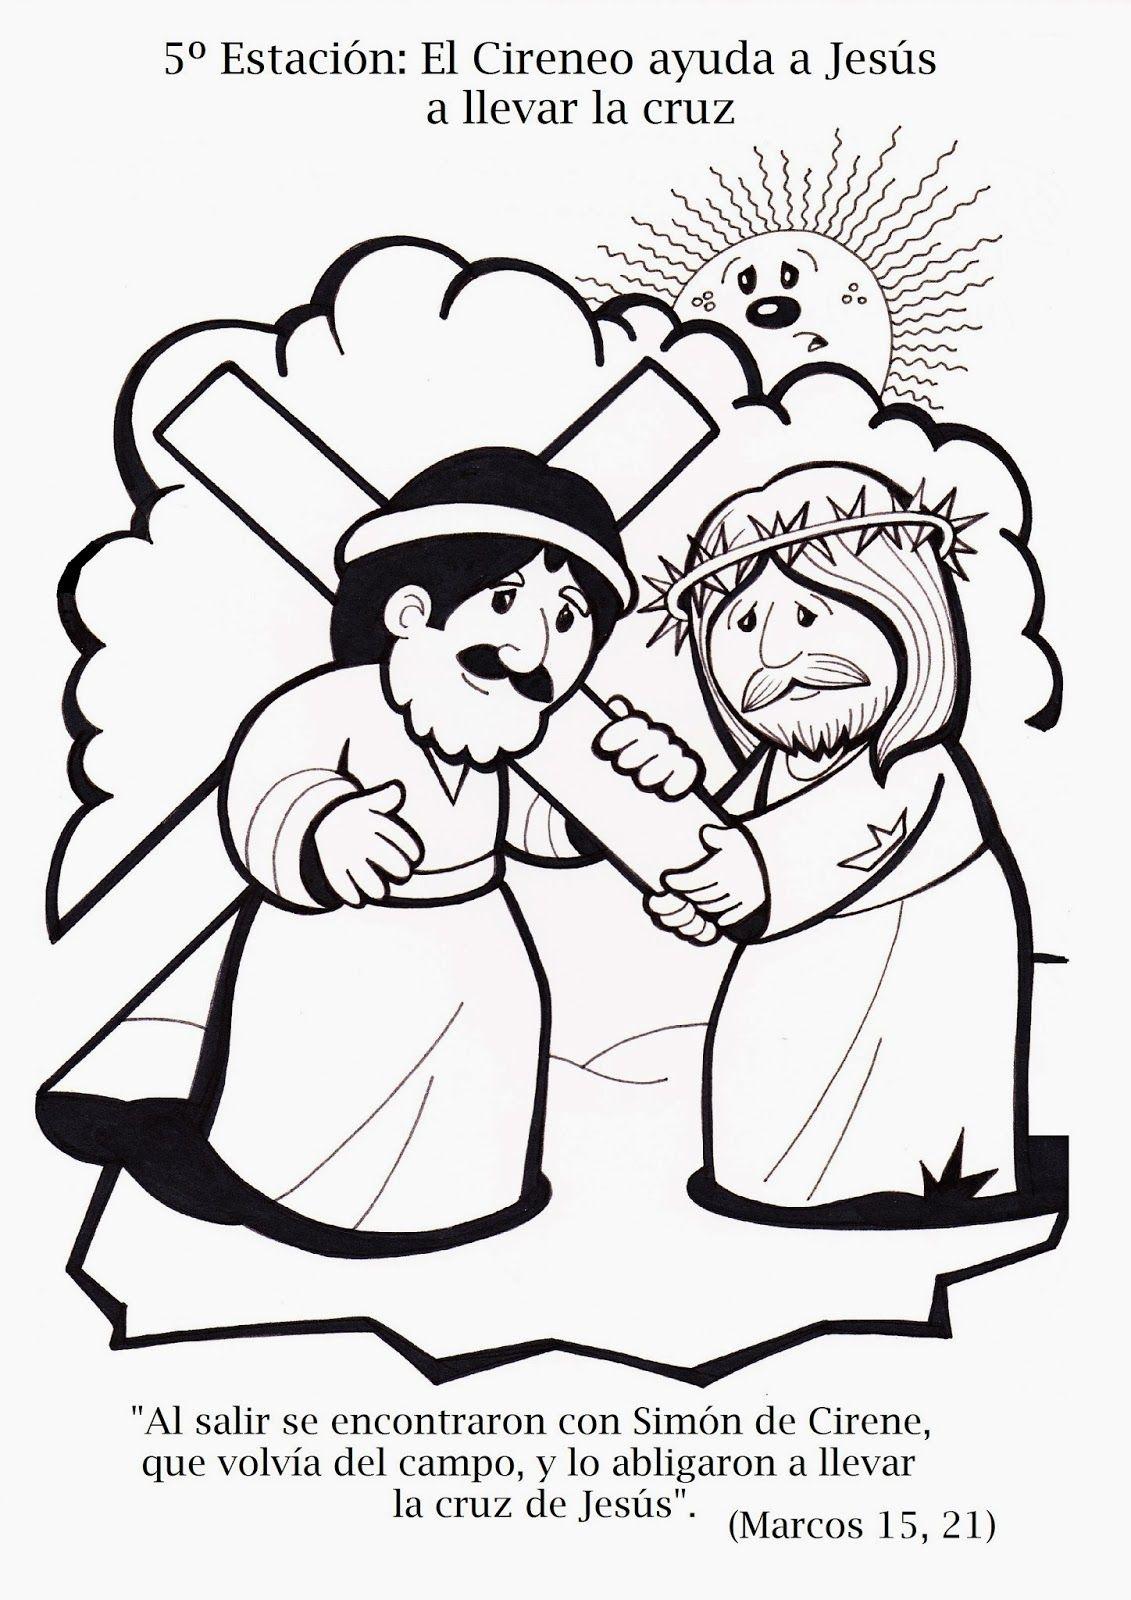 MATERIALES DE RELIGIÓN CATÓLICA: LasMelli | RELIGION | Pinterest ...